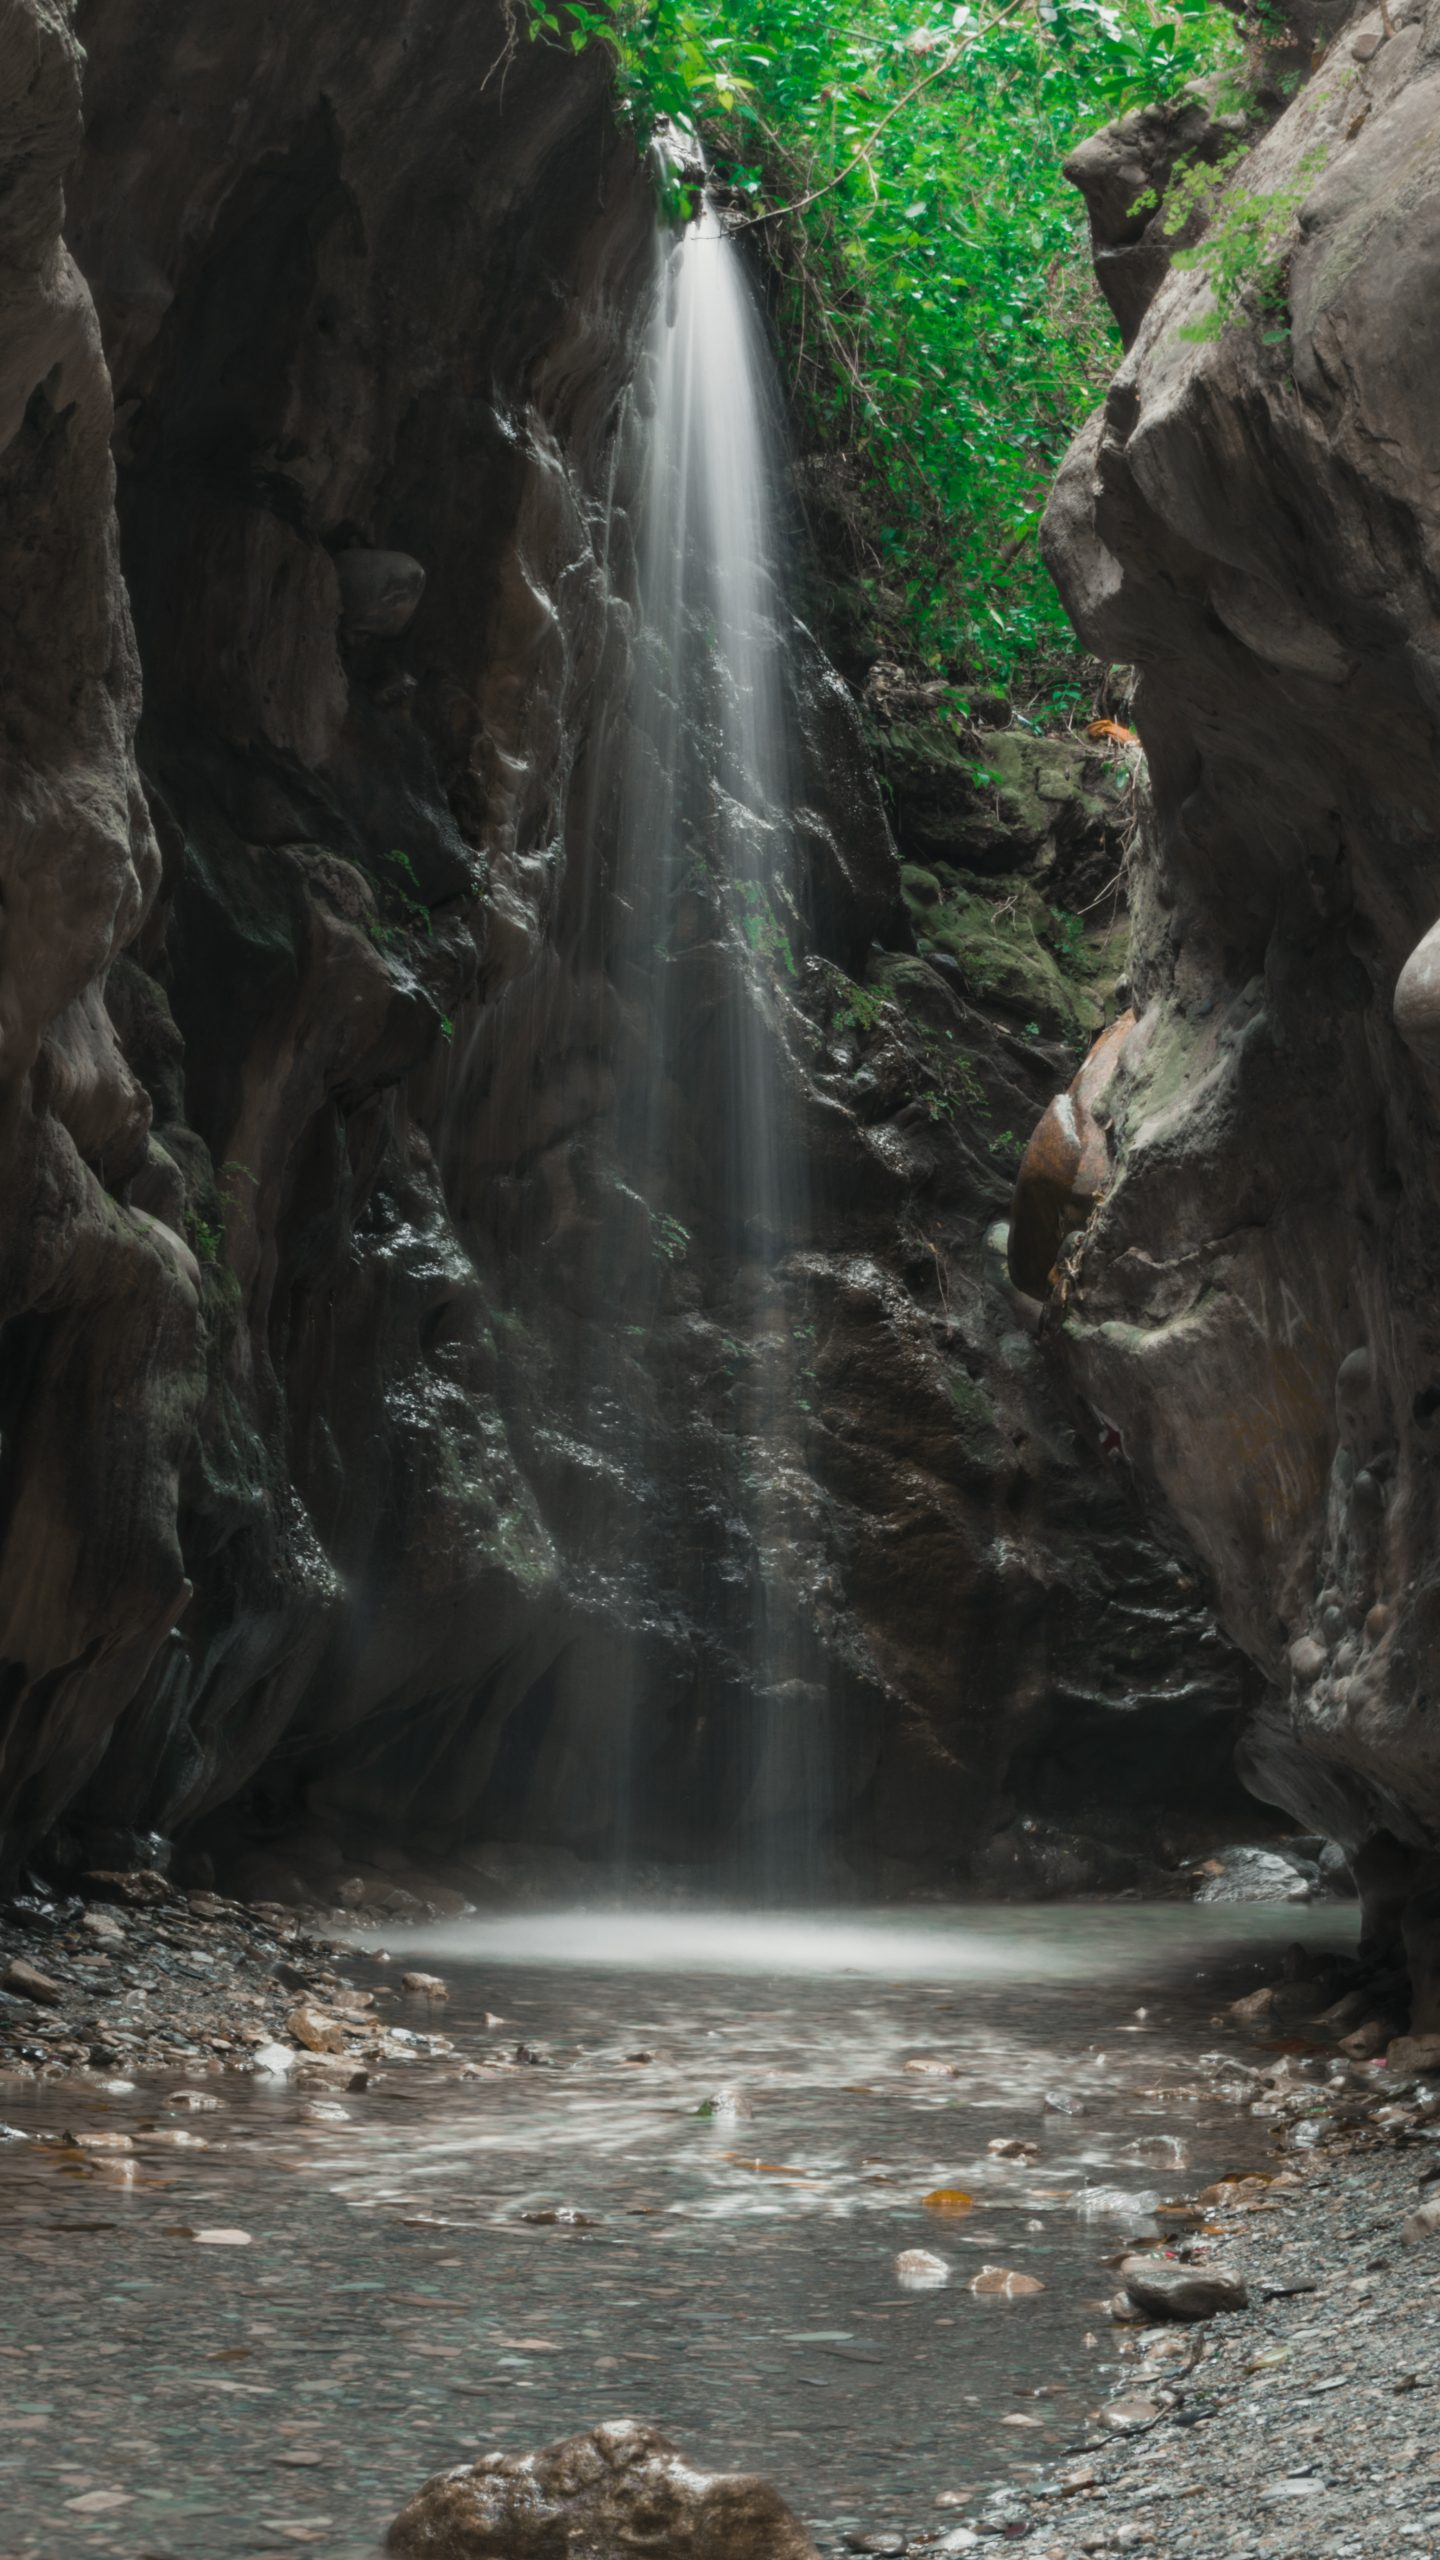 Waterfall on Narrow Rocks